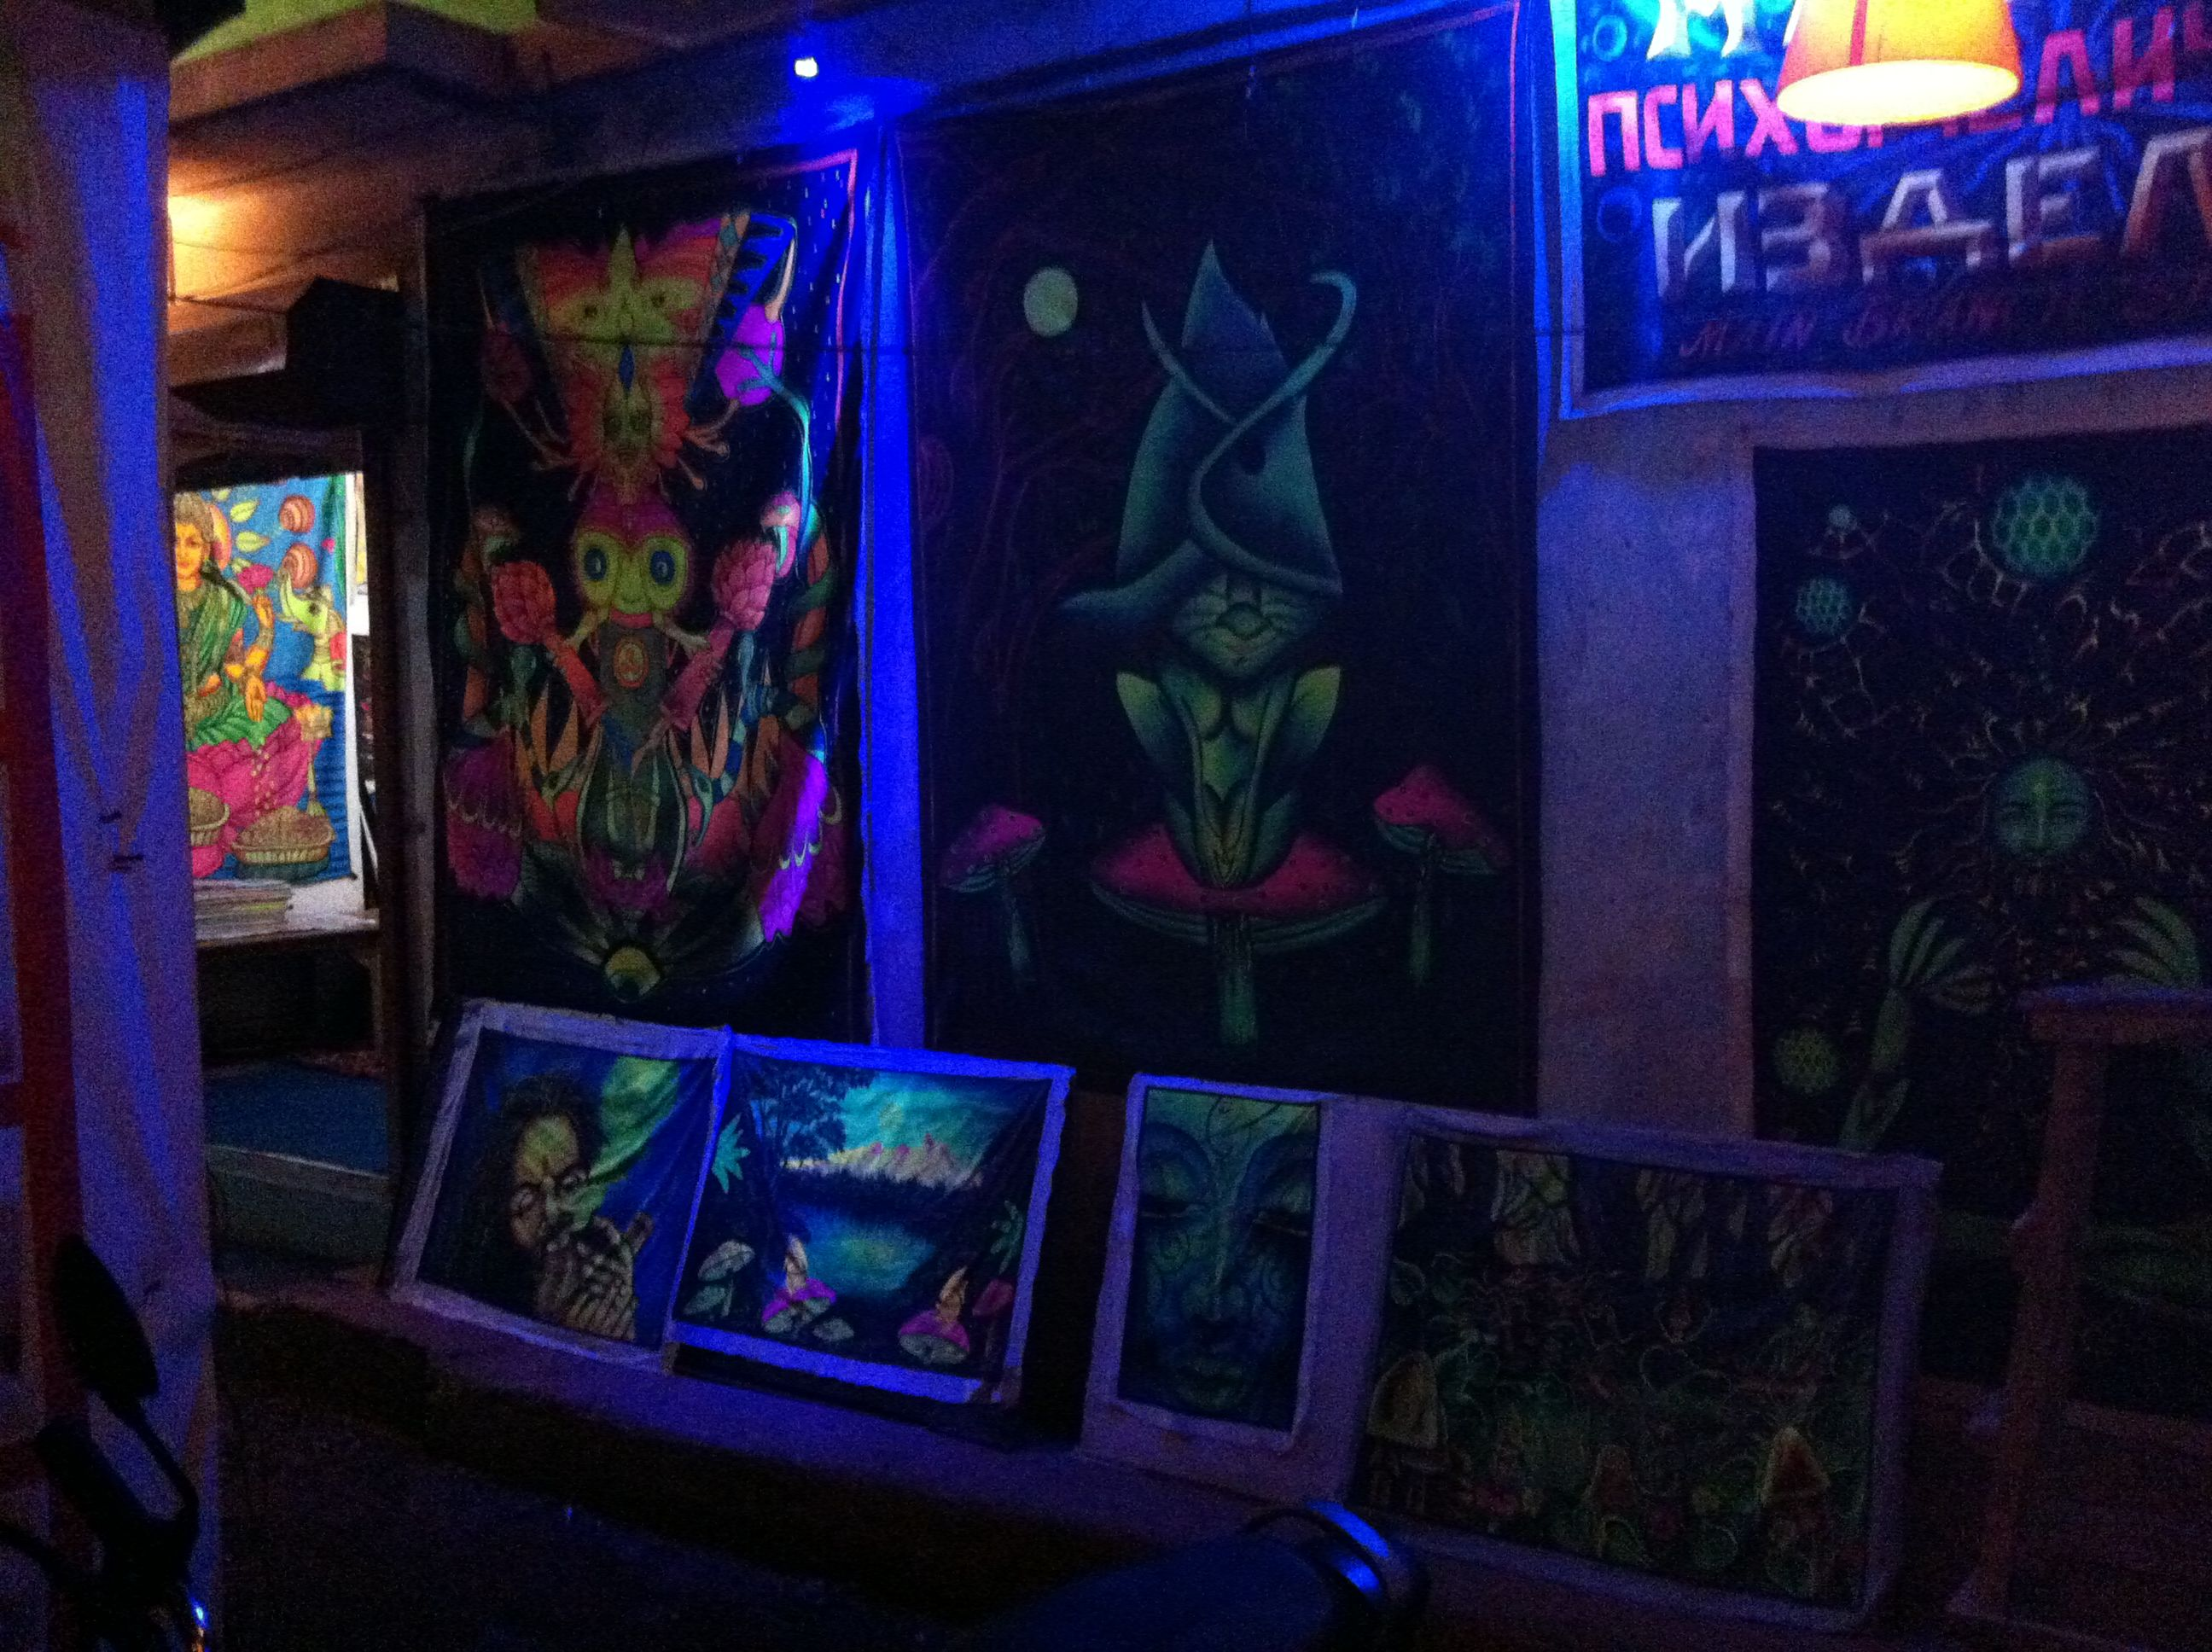 Goa psychedelic art shop. www.nomad40.com